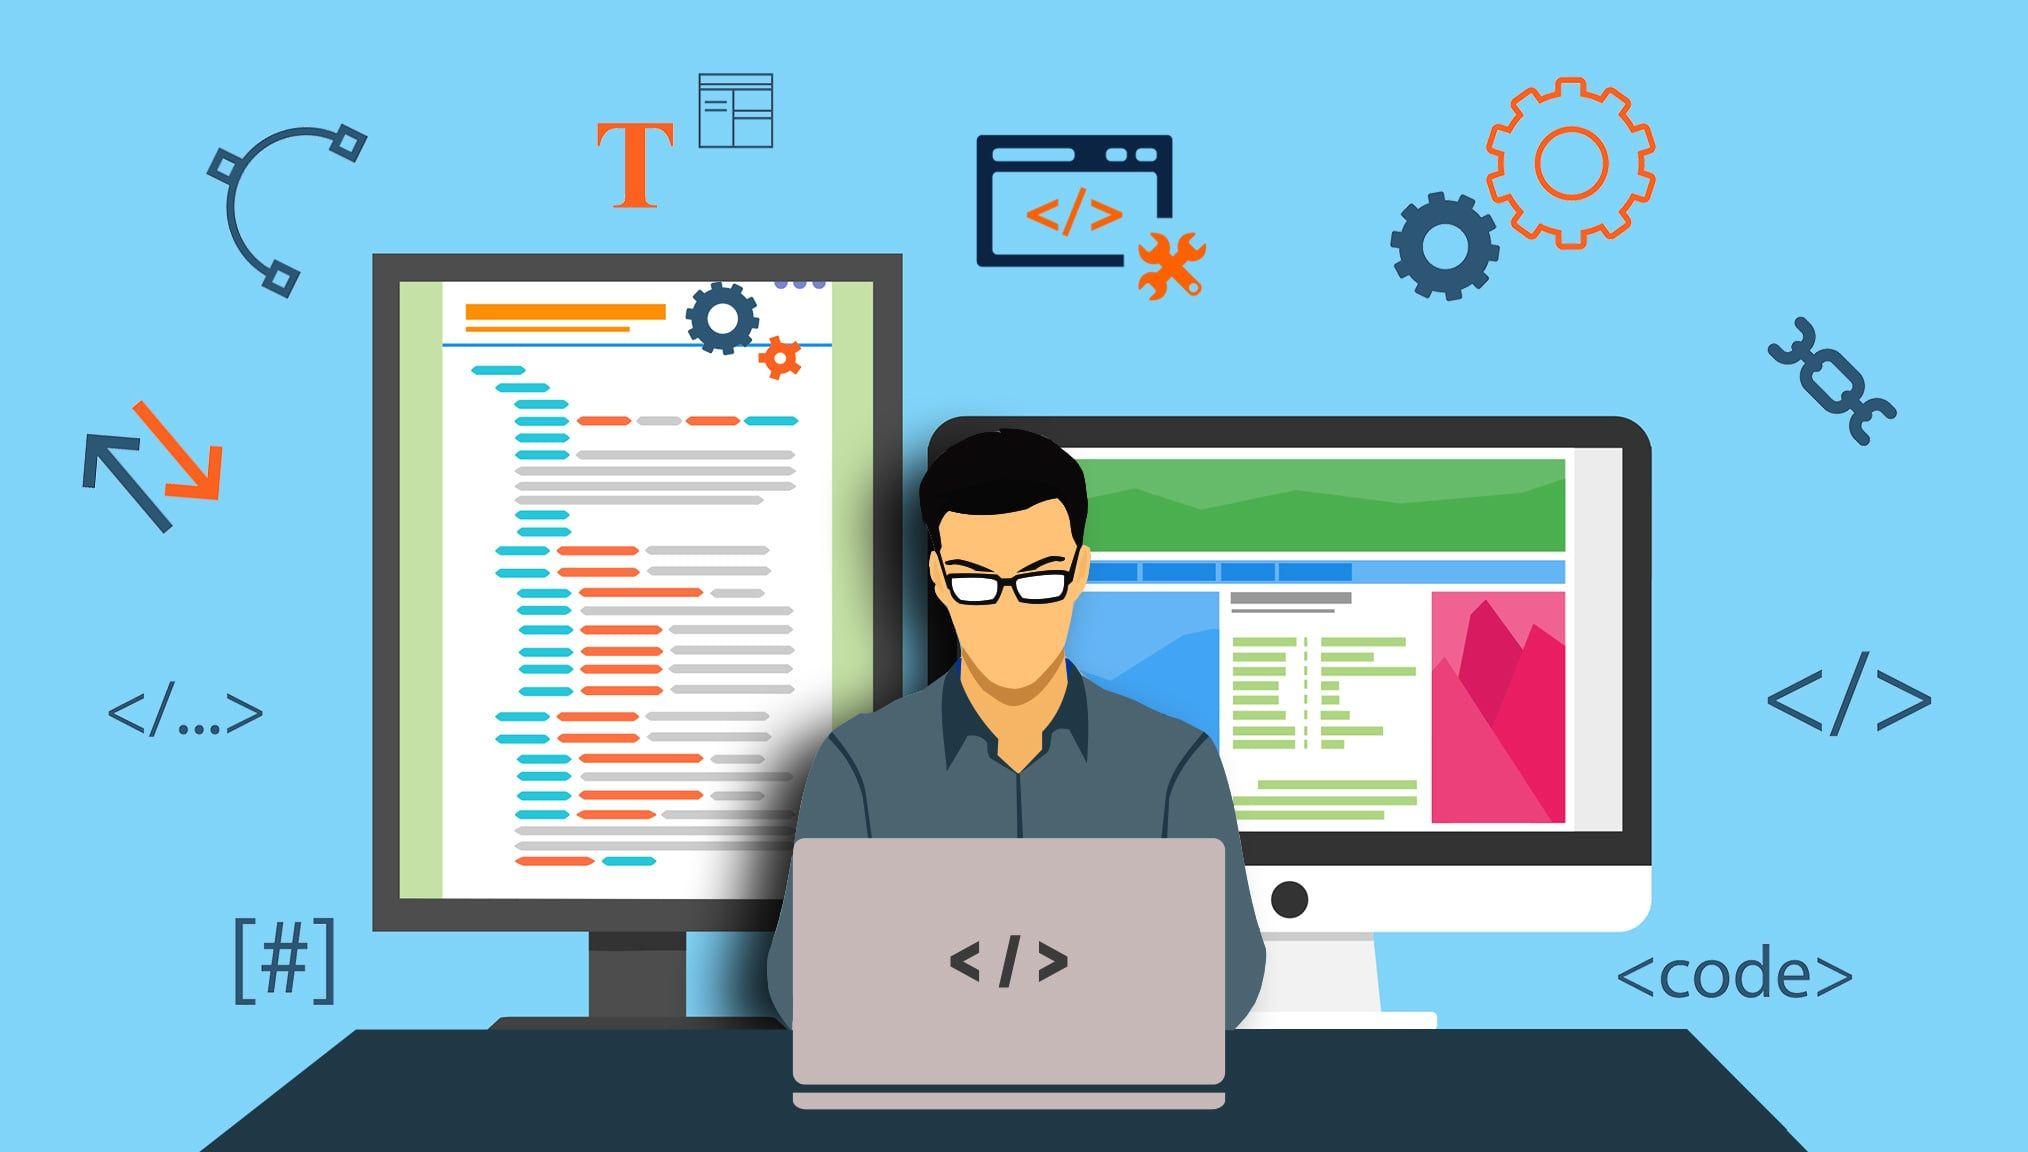 Course Intro Web Development Course Web Development Design Web Development